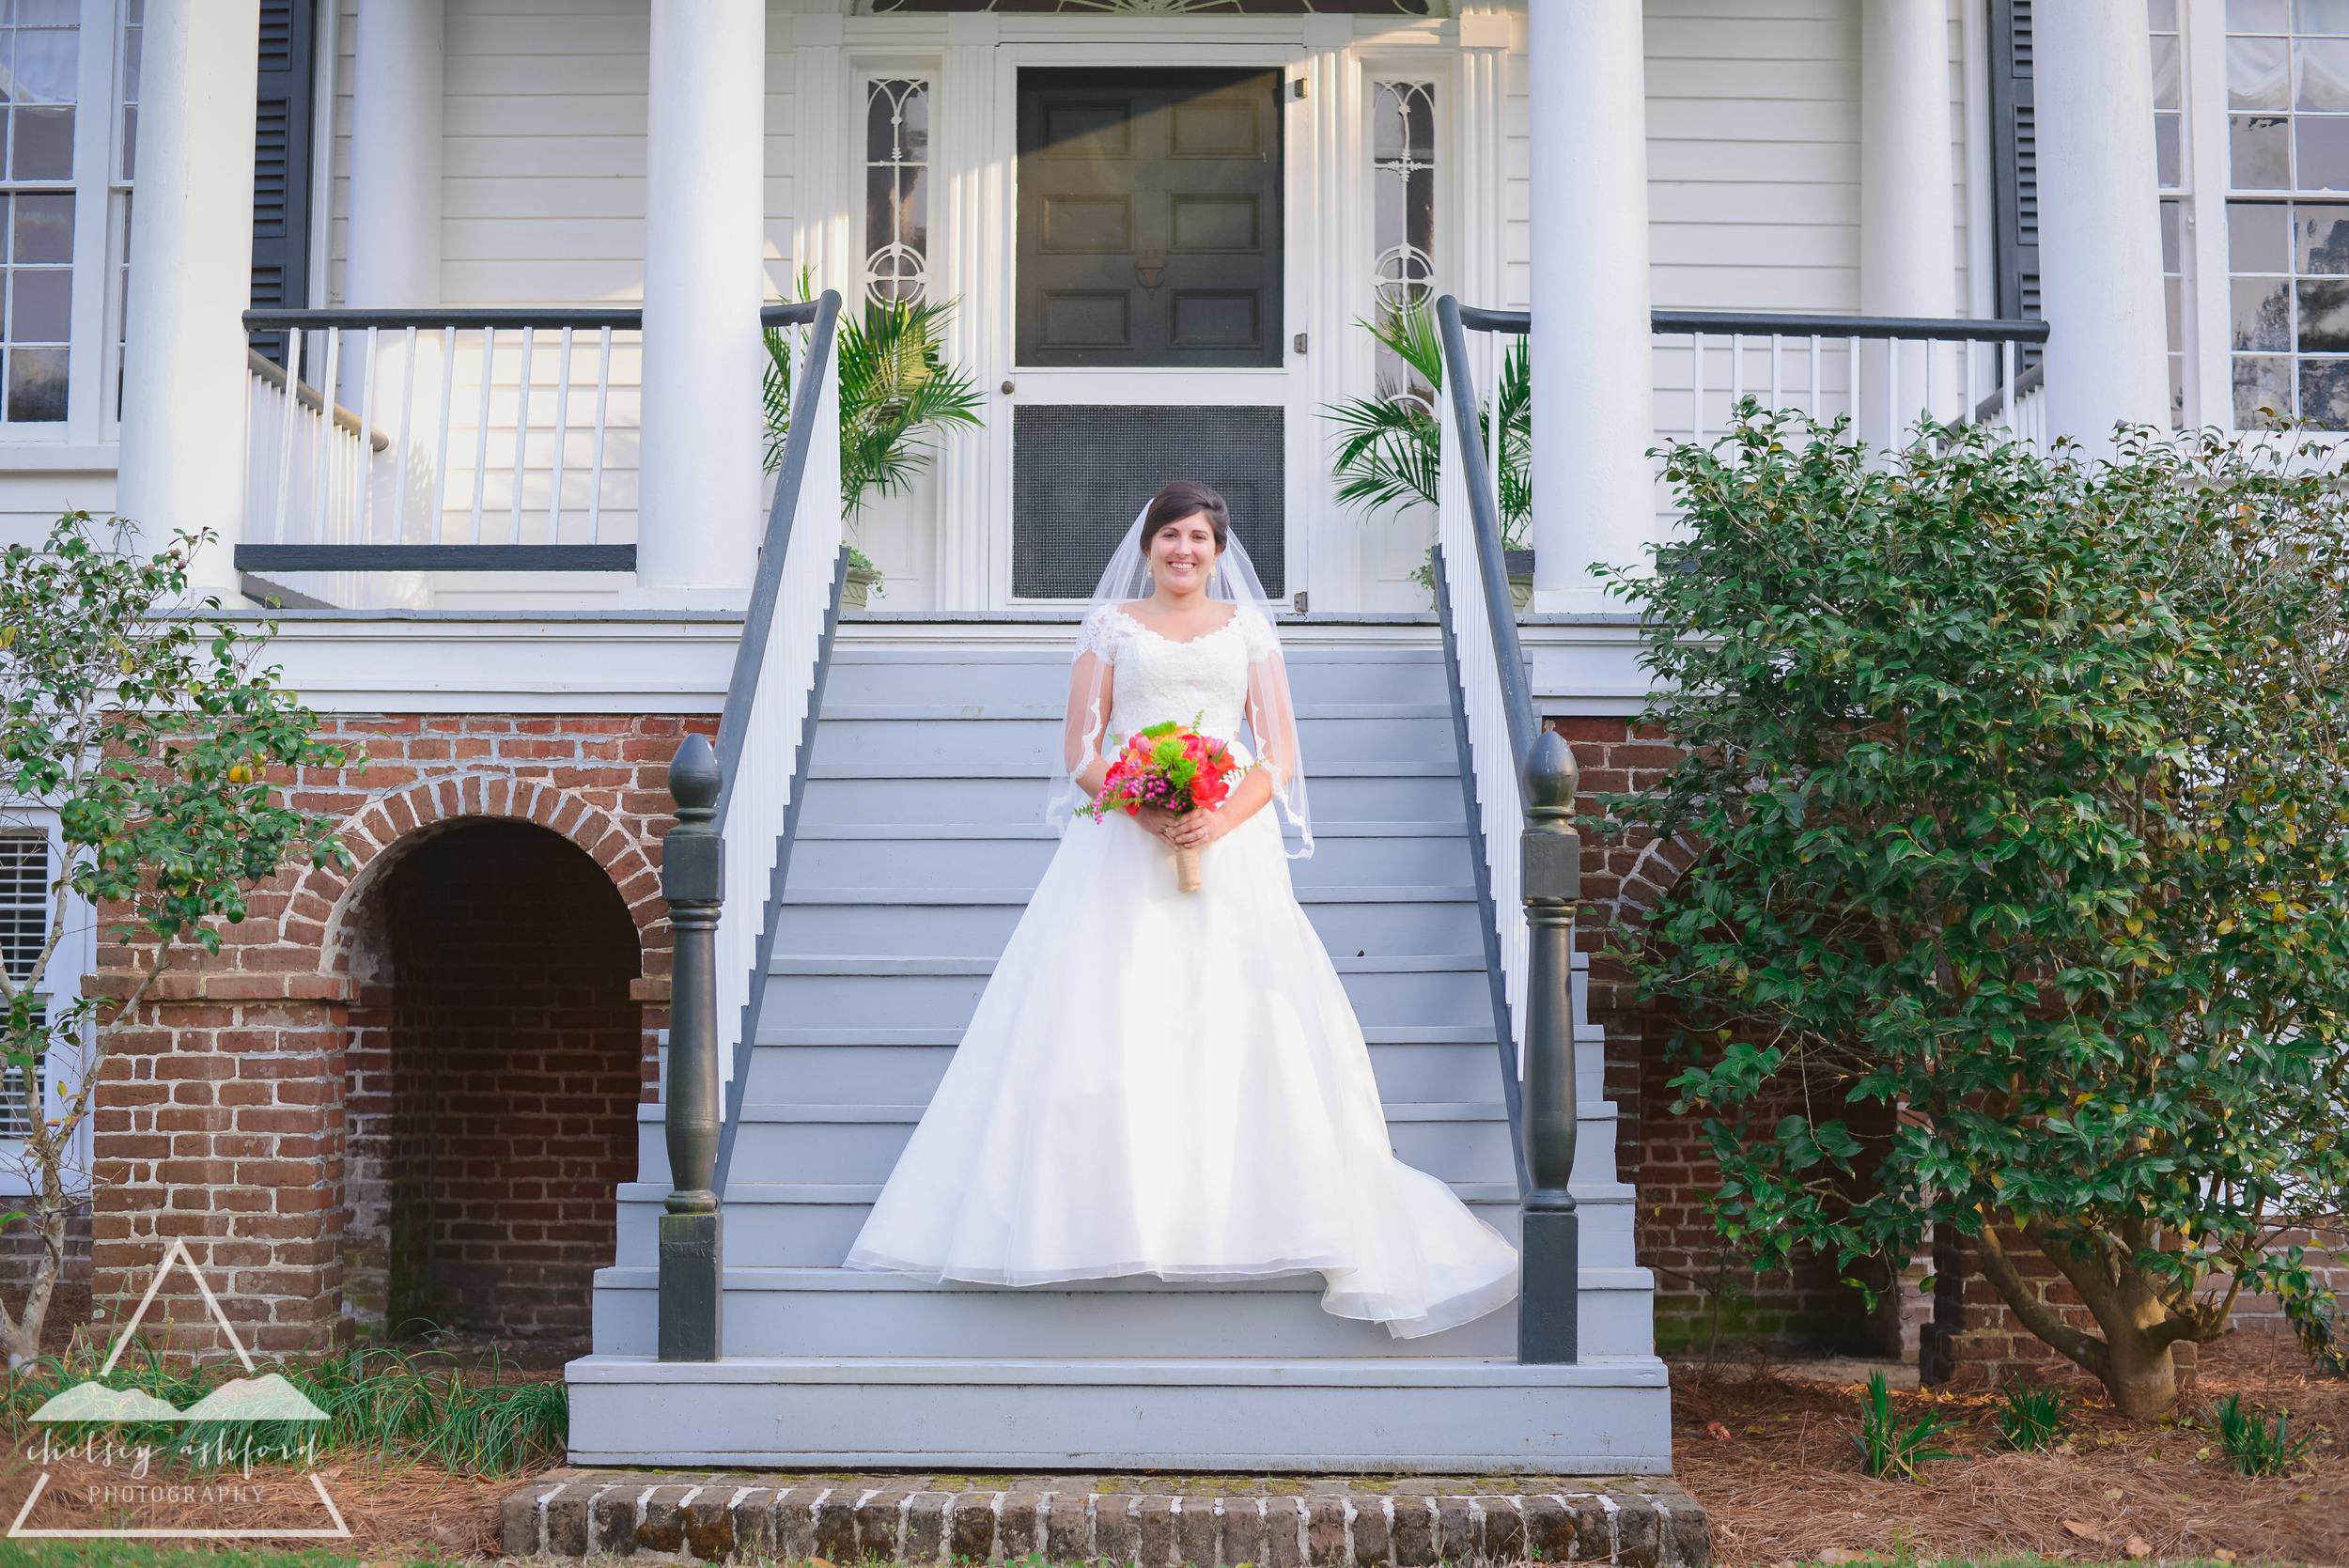 Sylvia_bridals_web-4.jpg